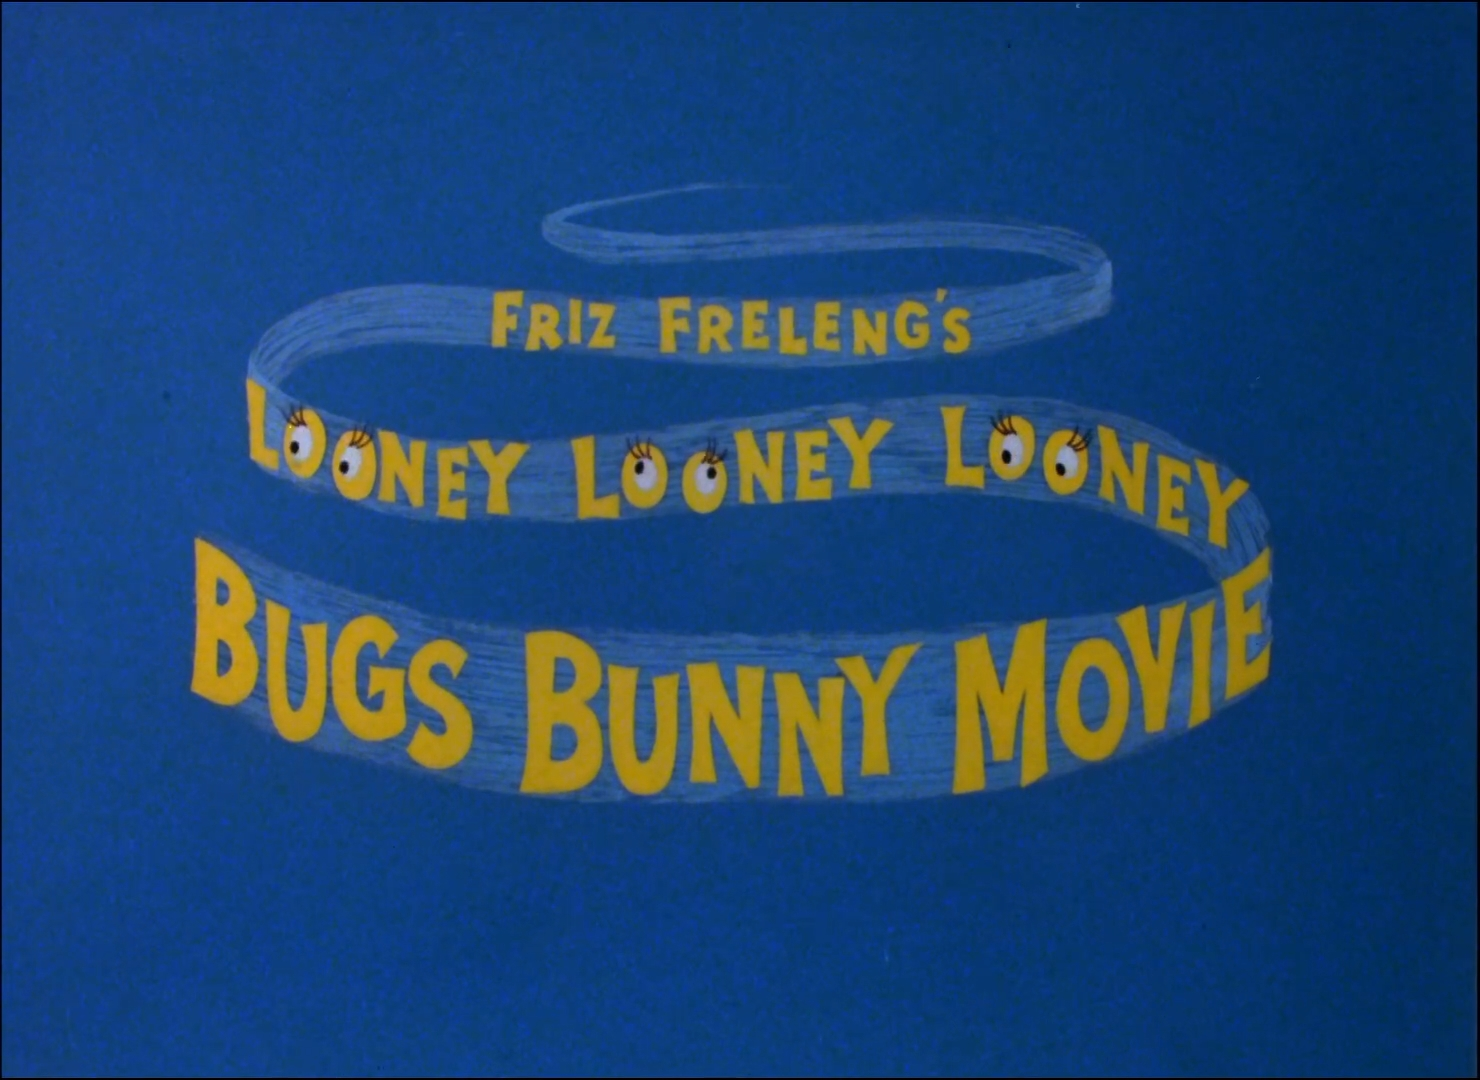 Looney Looney Looney Bugs Bunny la pelicula (1981) 1080p Meg